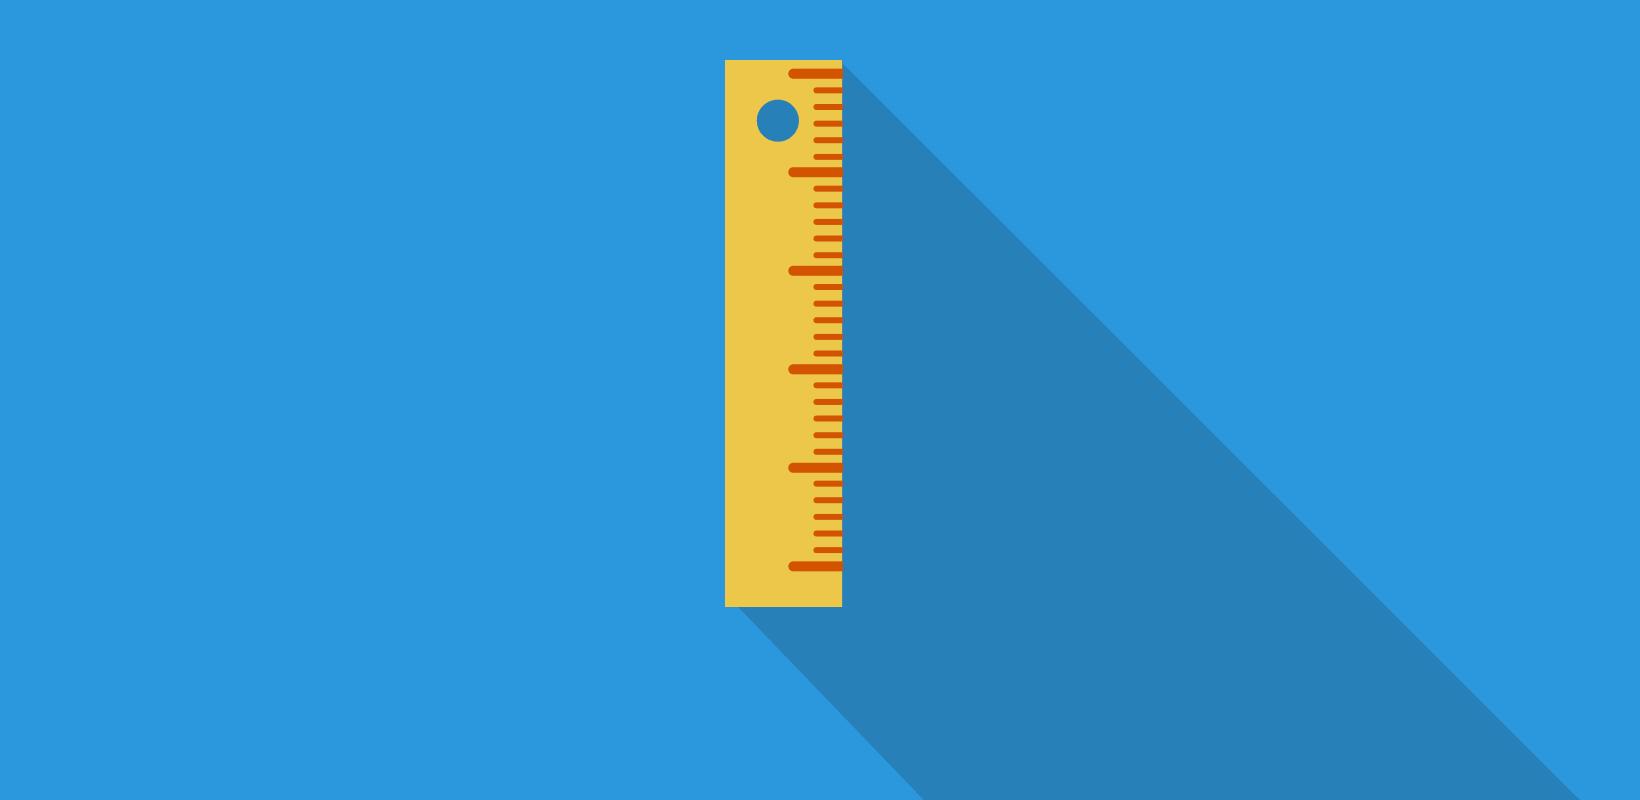 ruler - measuring key performance indicators